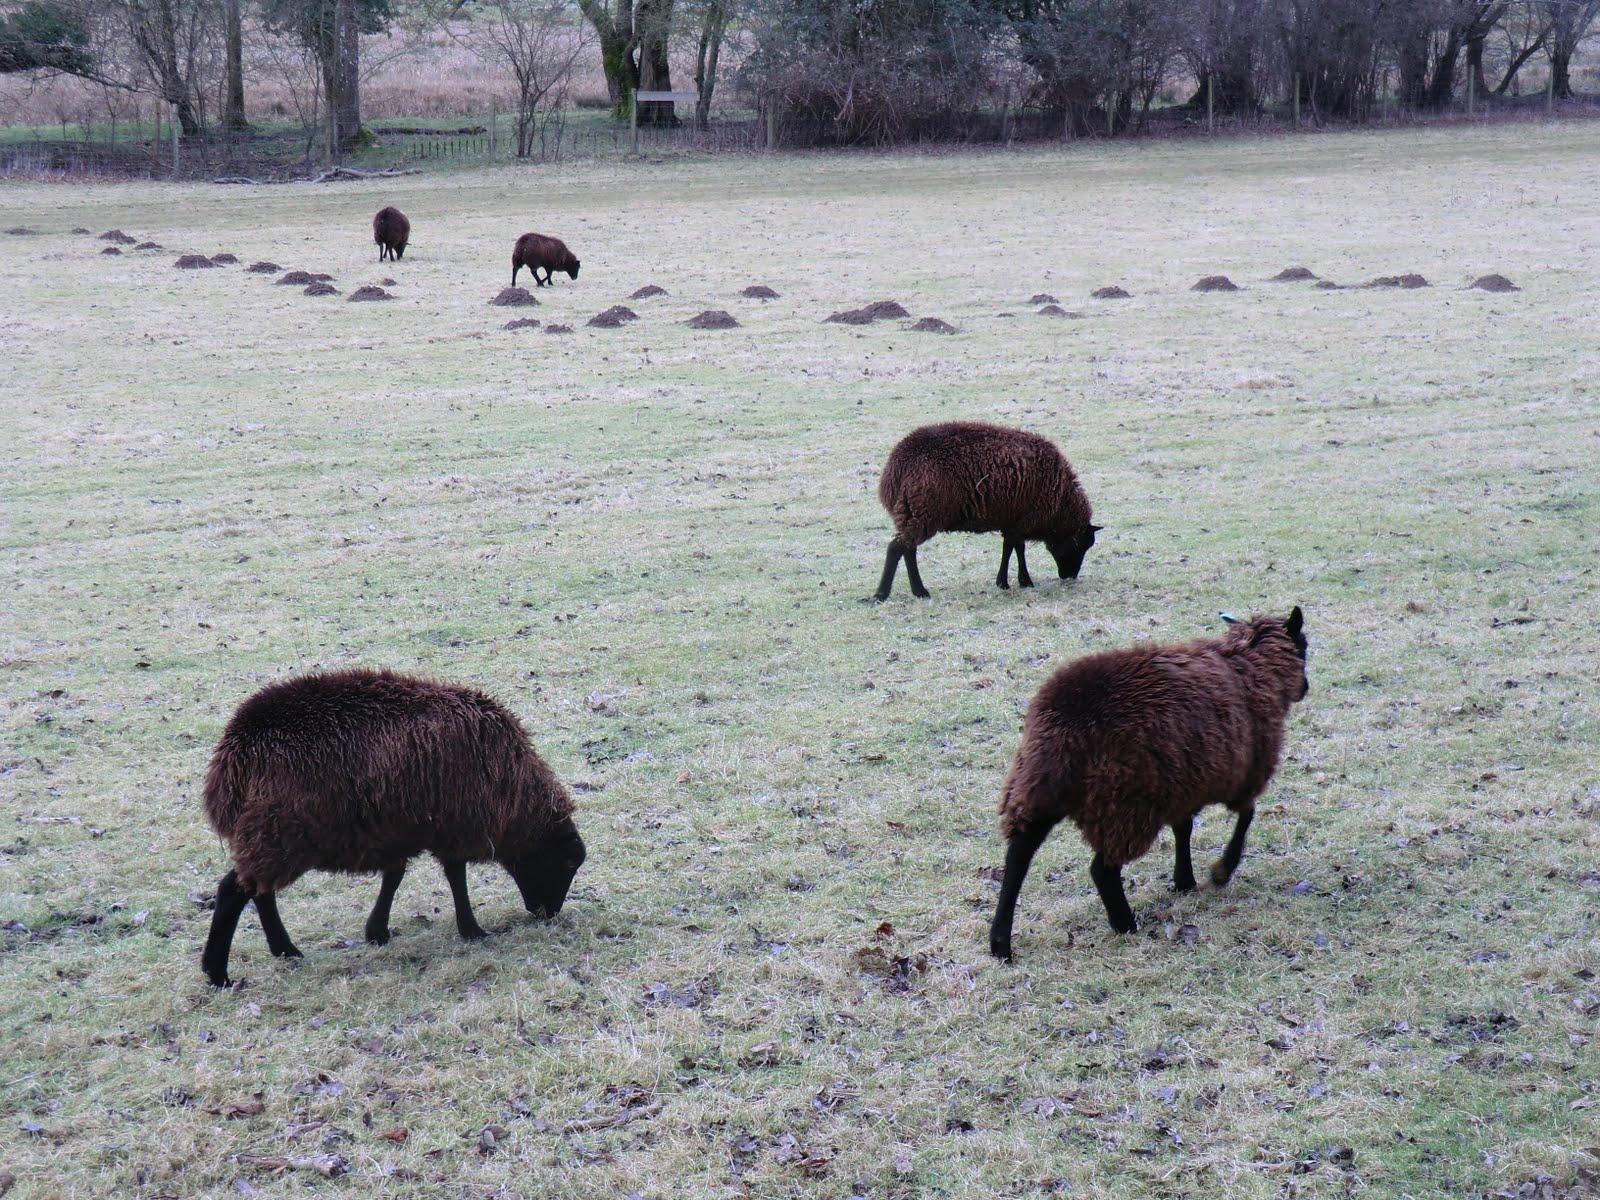 CIMG6696 Sheep and molehills in Coombedown Hanger